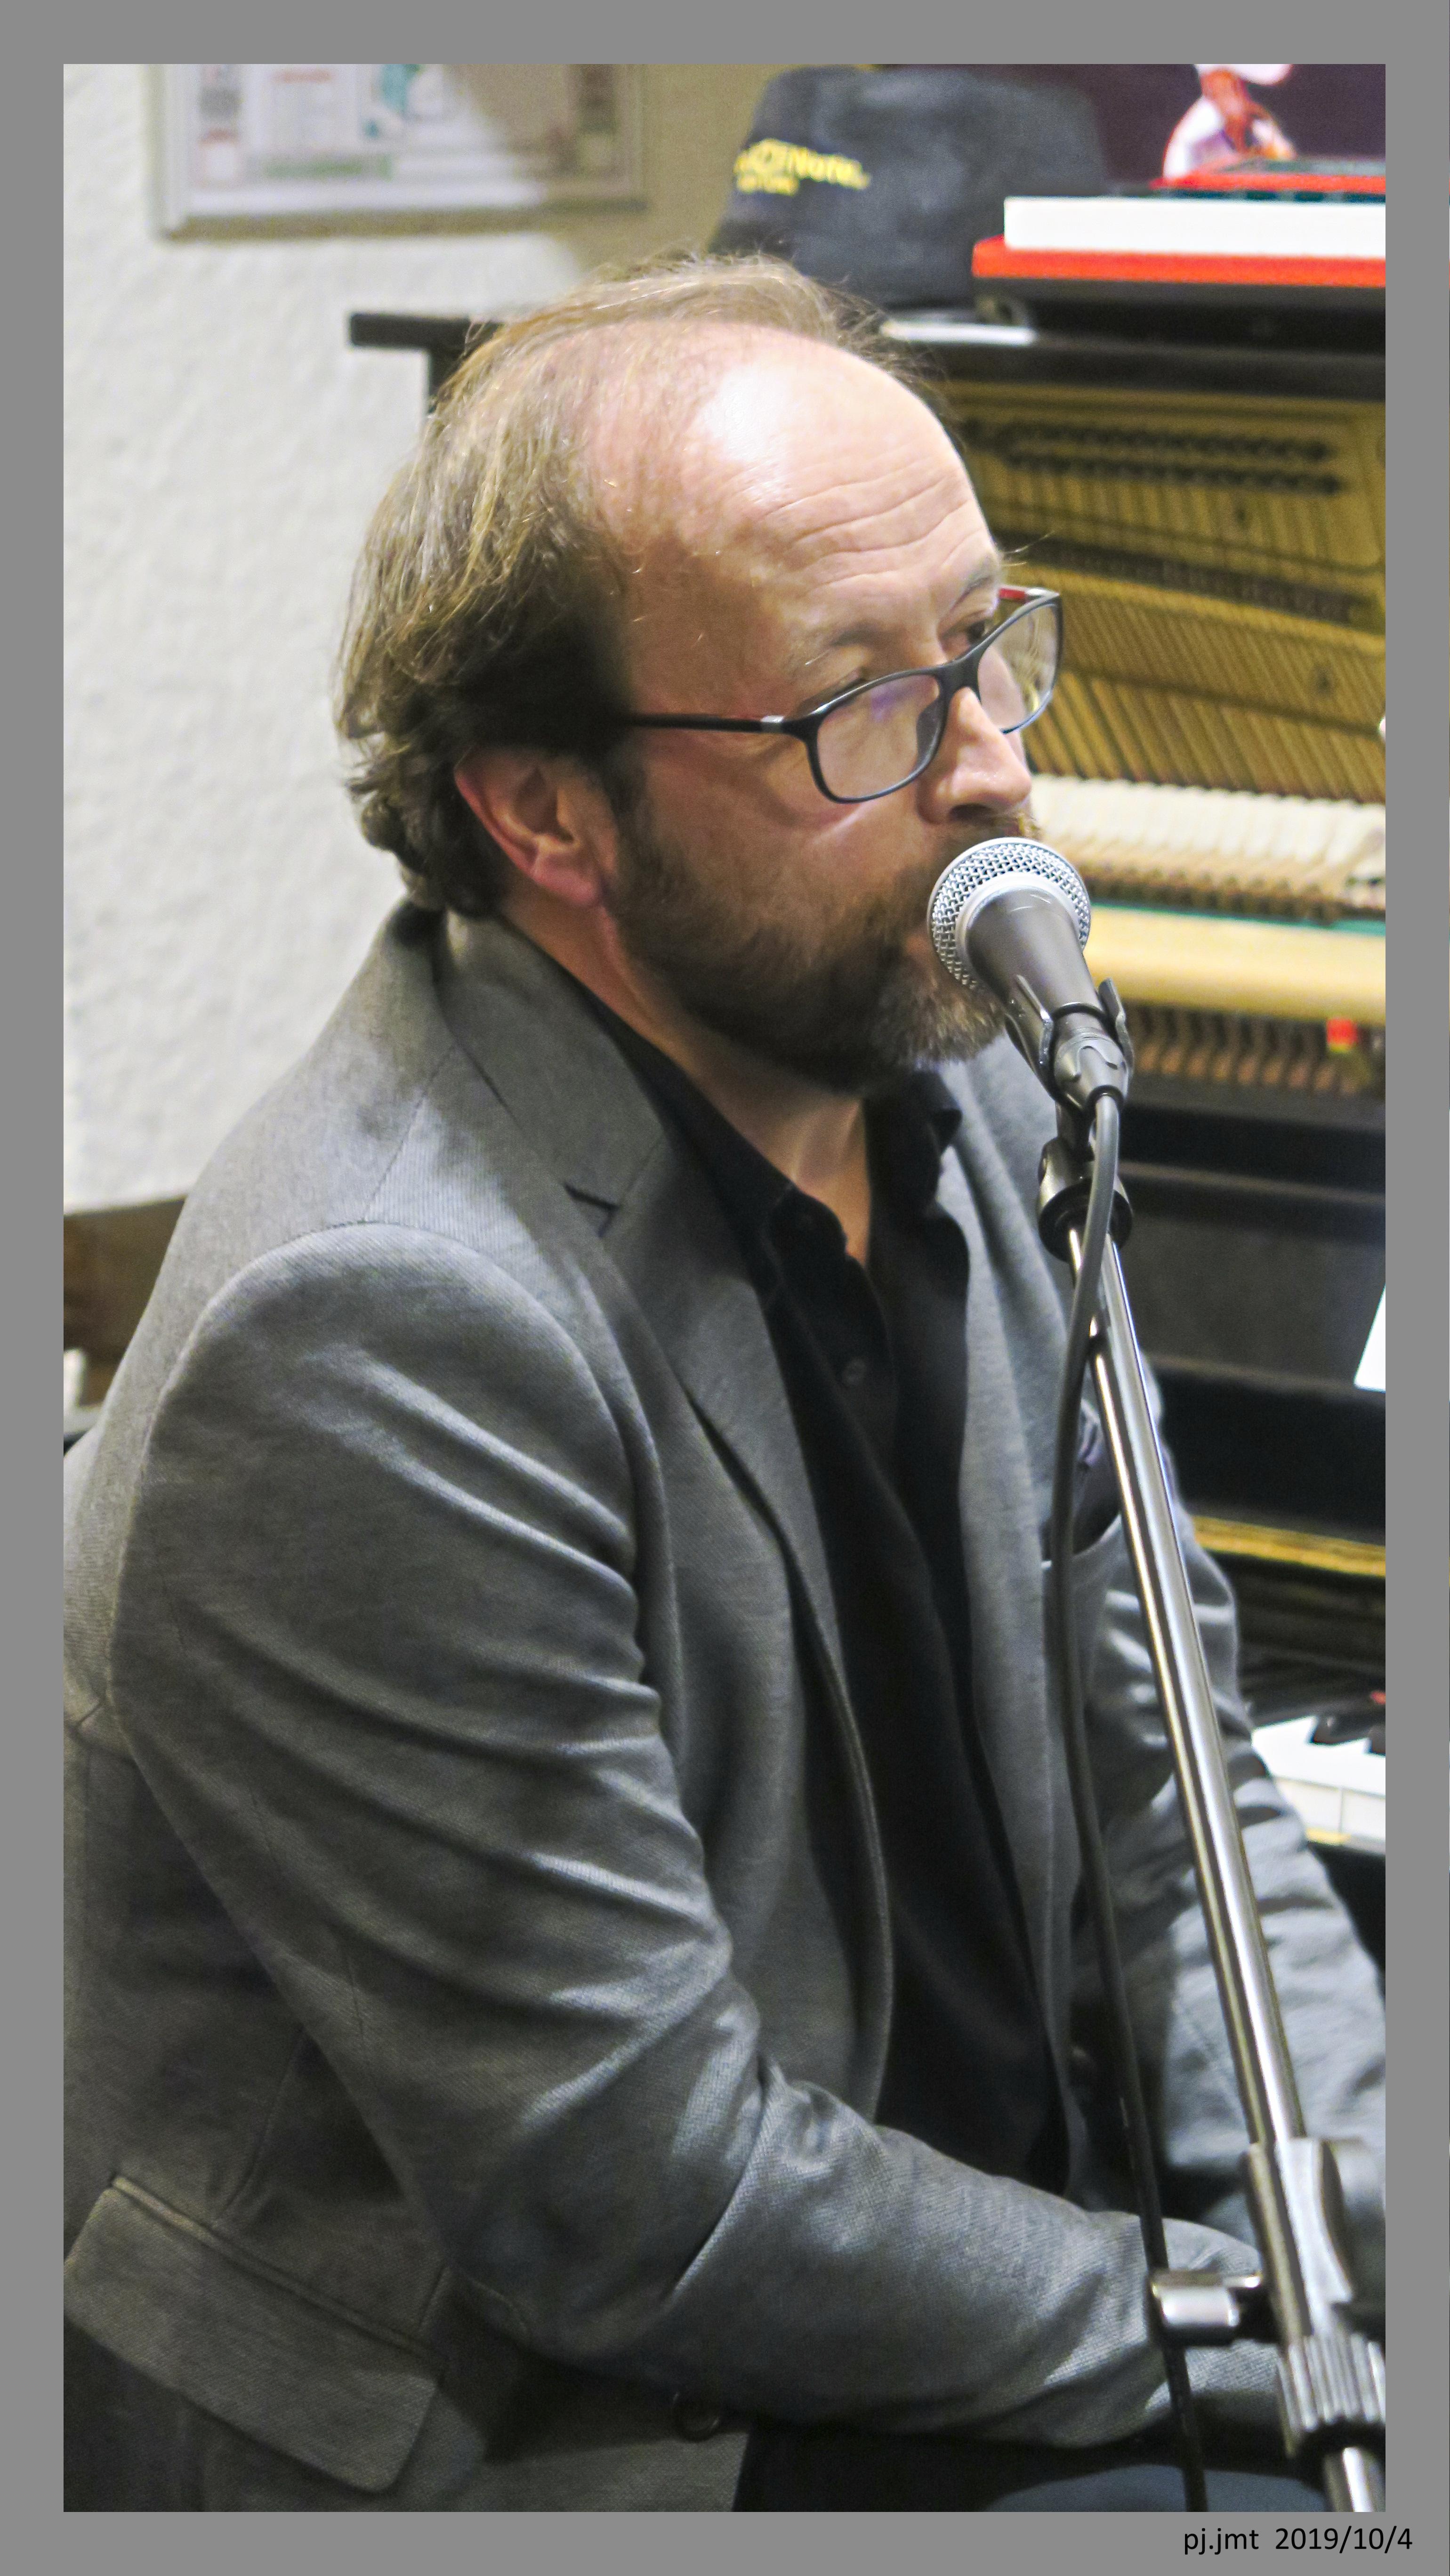 Alain Valverde